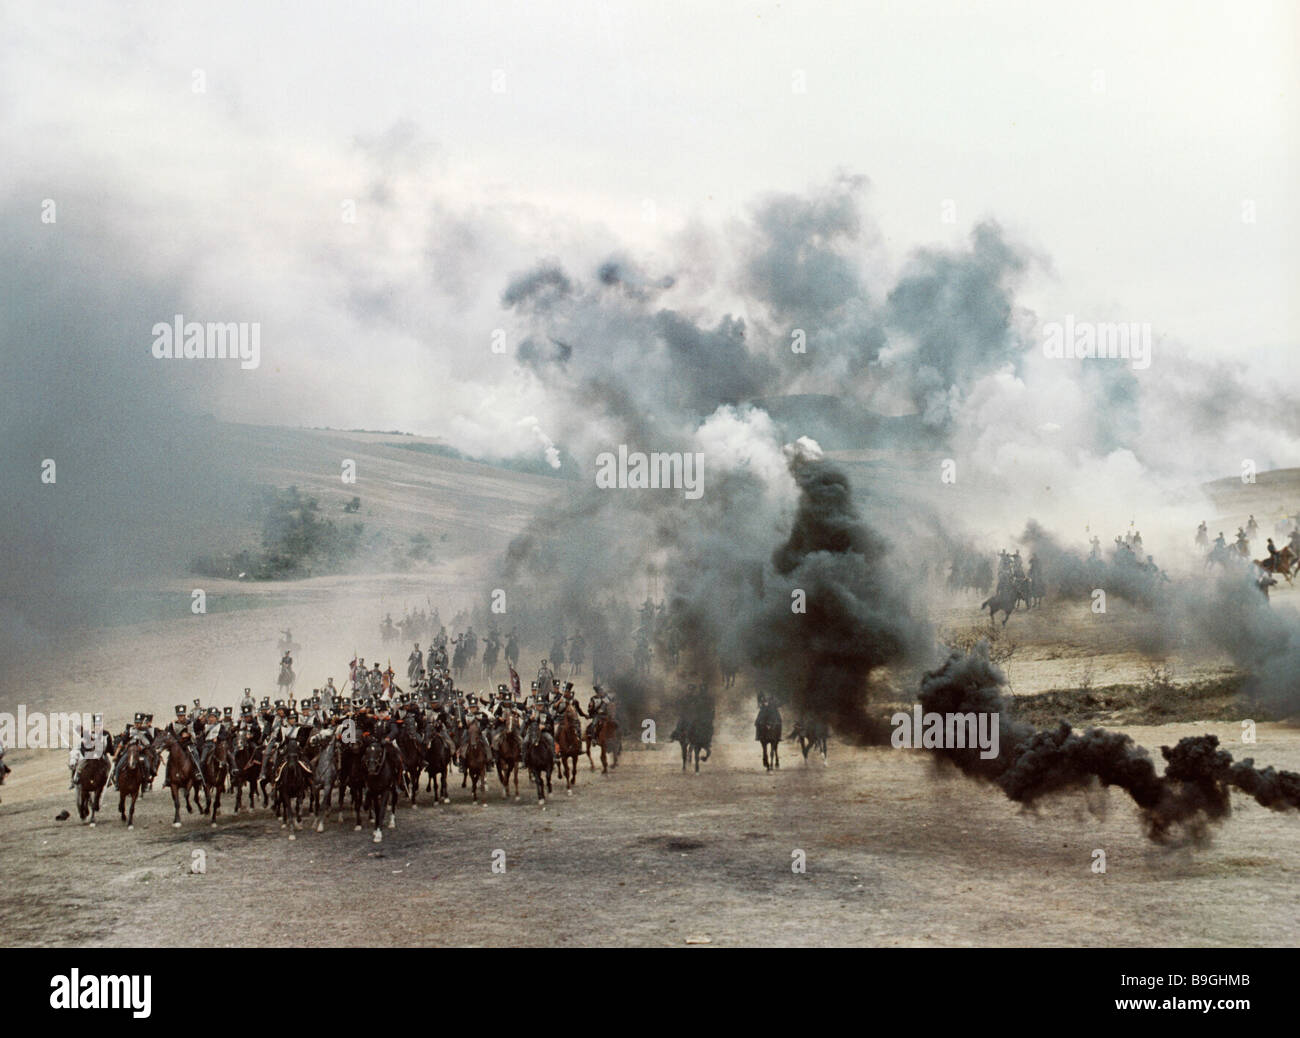 A battle scene from the film Waterloo Sergei Bondarchuk director - Stock Image